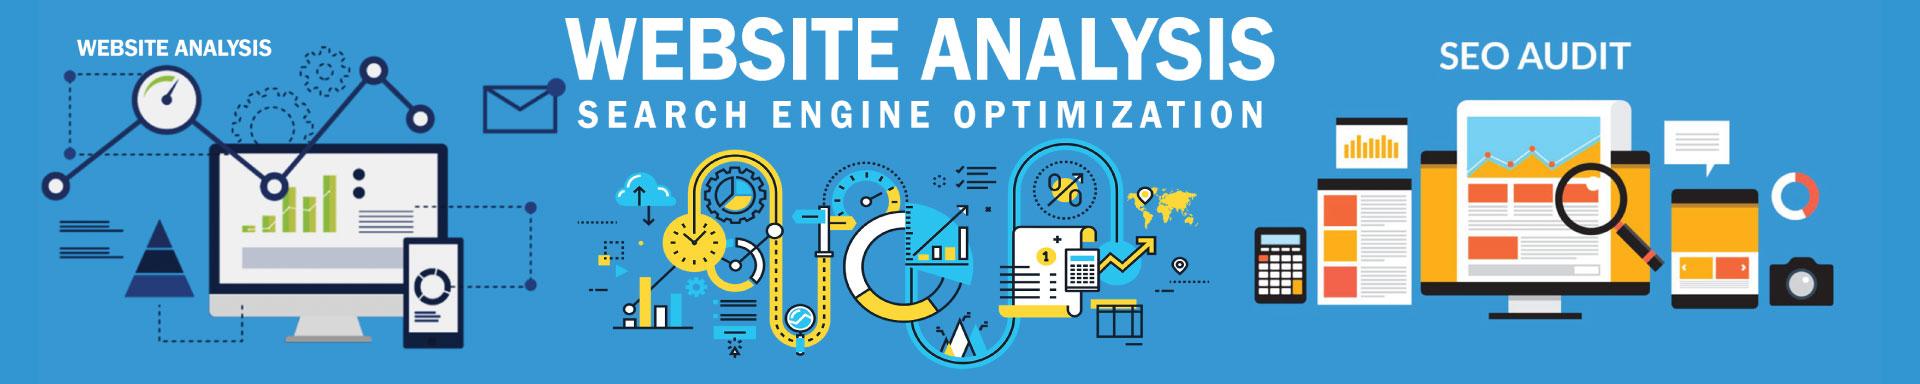 Webiste analysis